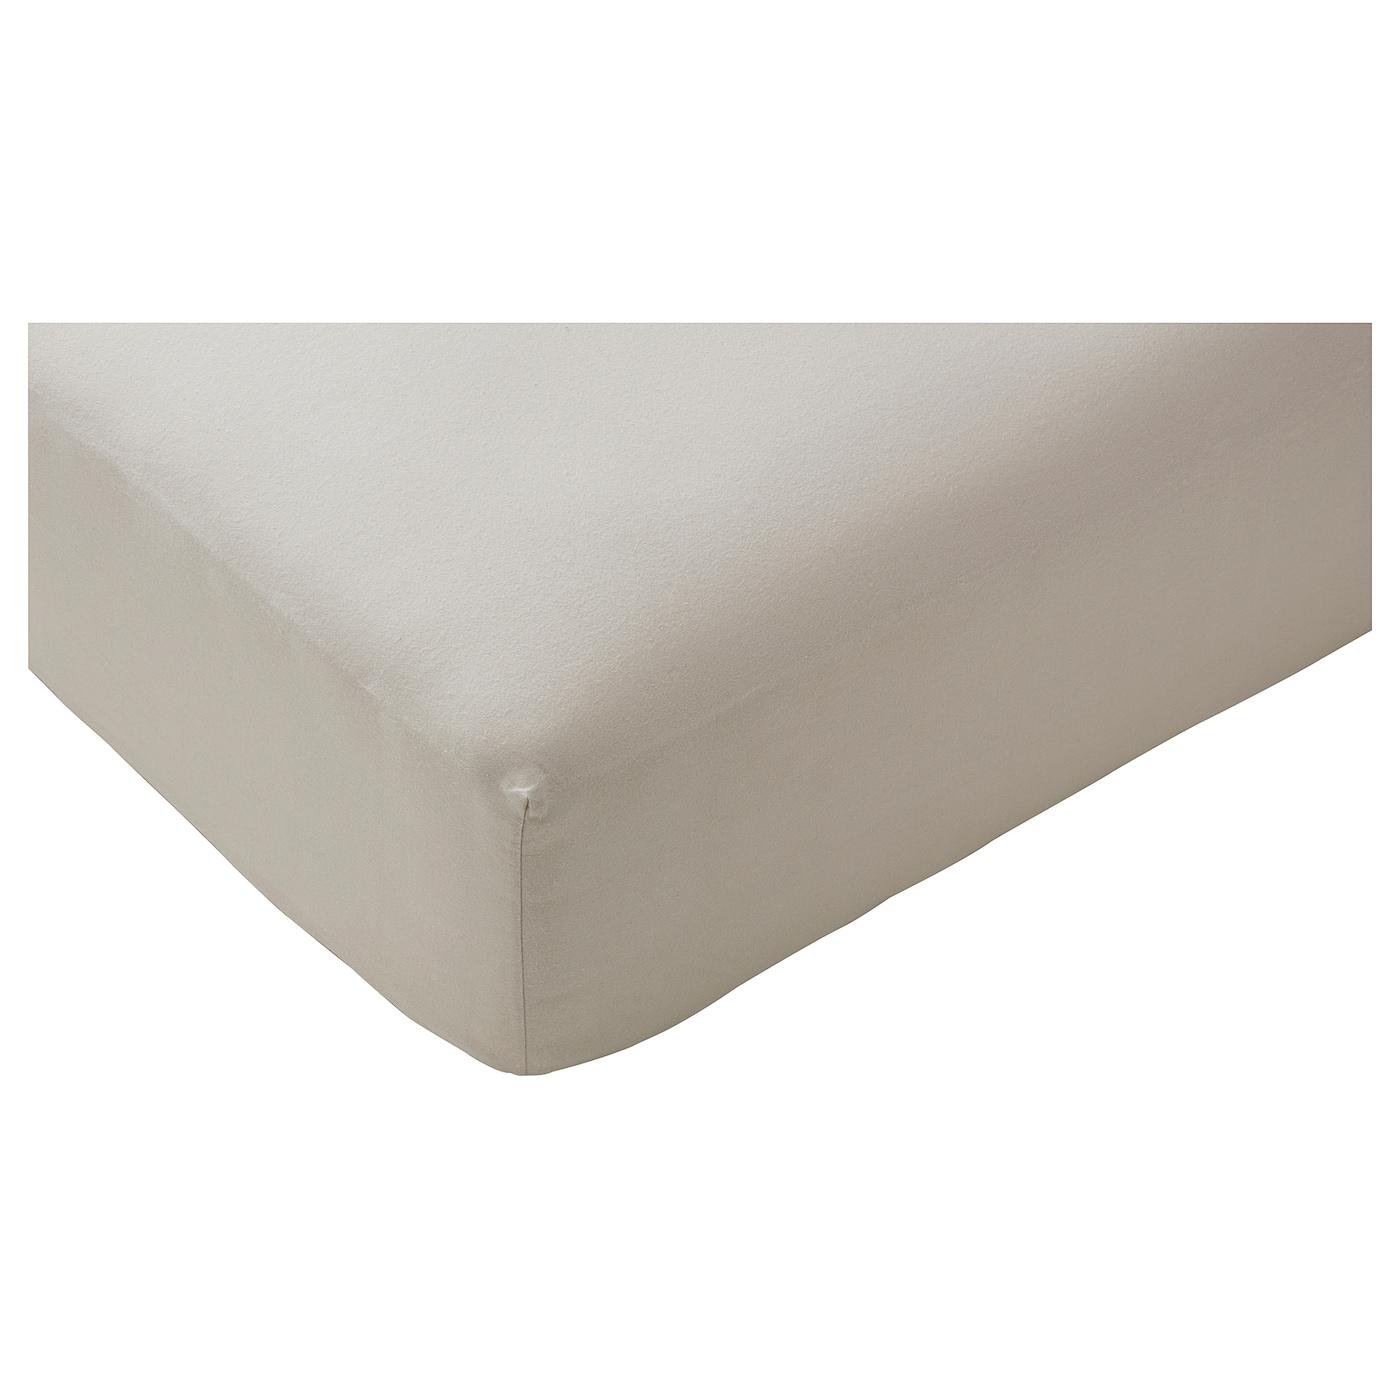 drap housse pour matelas 26 cm BLÅSUGA Drap housse Gris clair 180x200 cm   IKEA drap housse pour matelas 26 cm